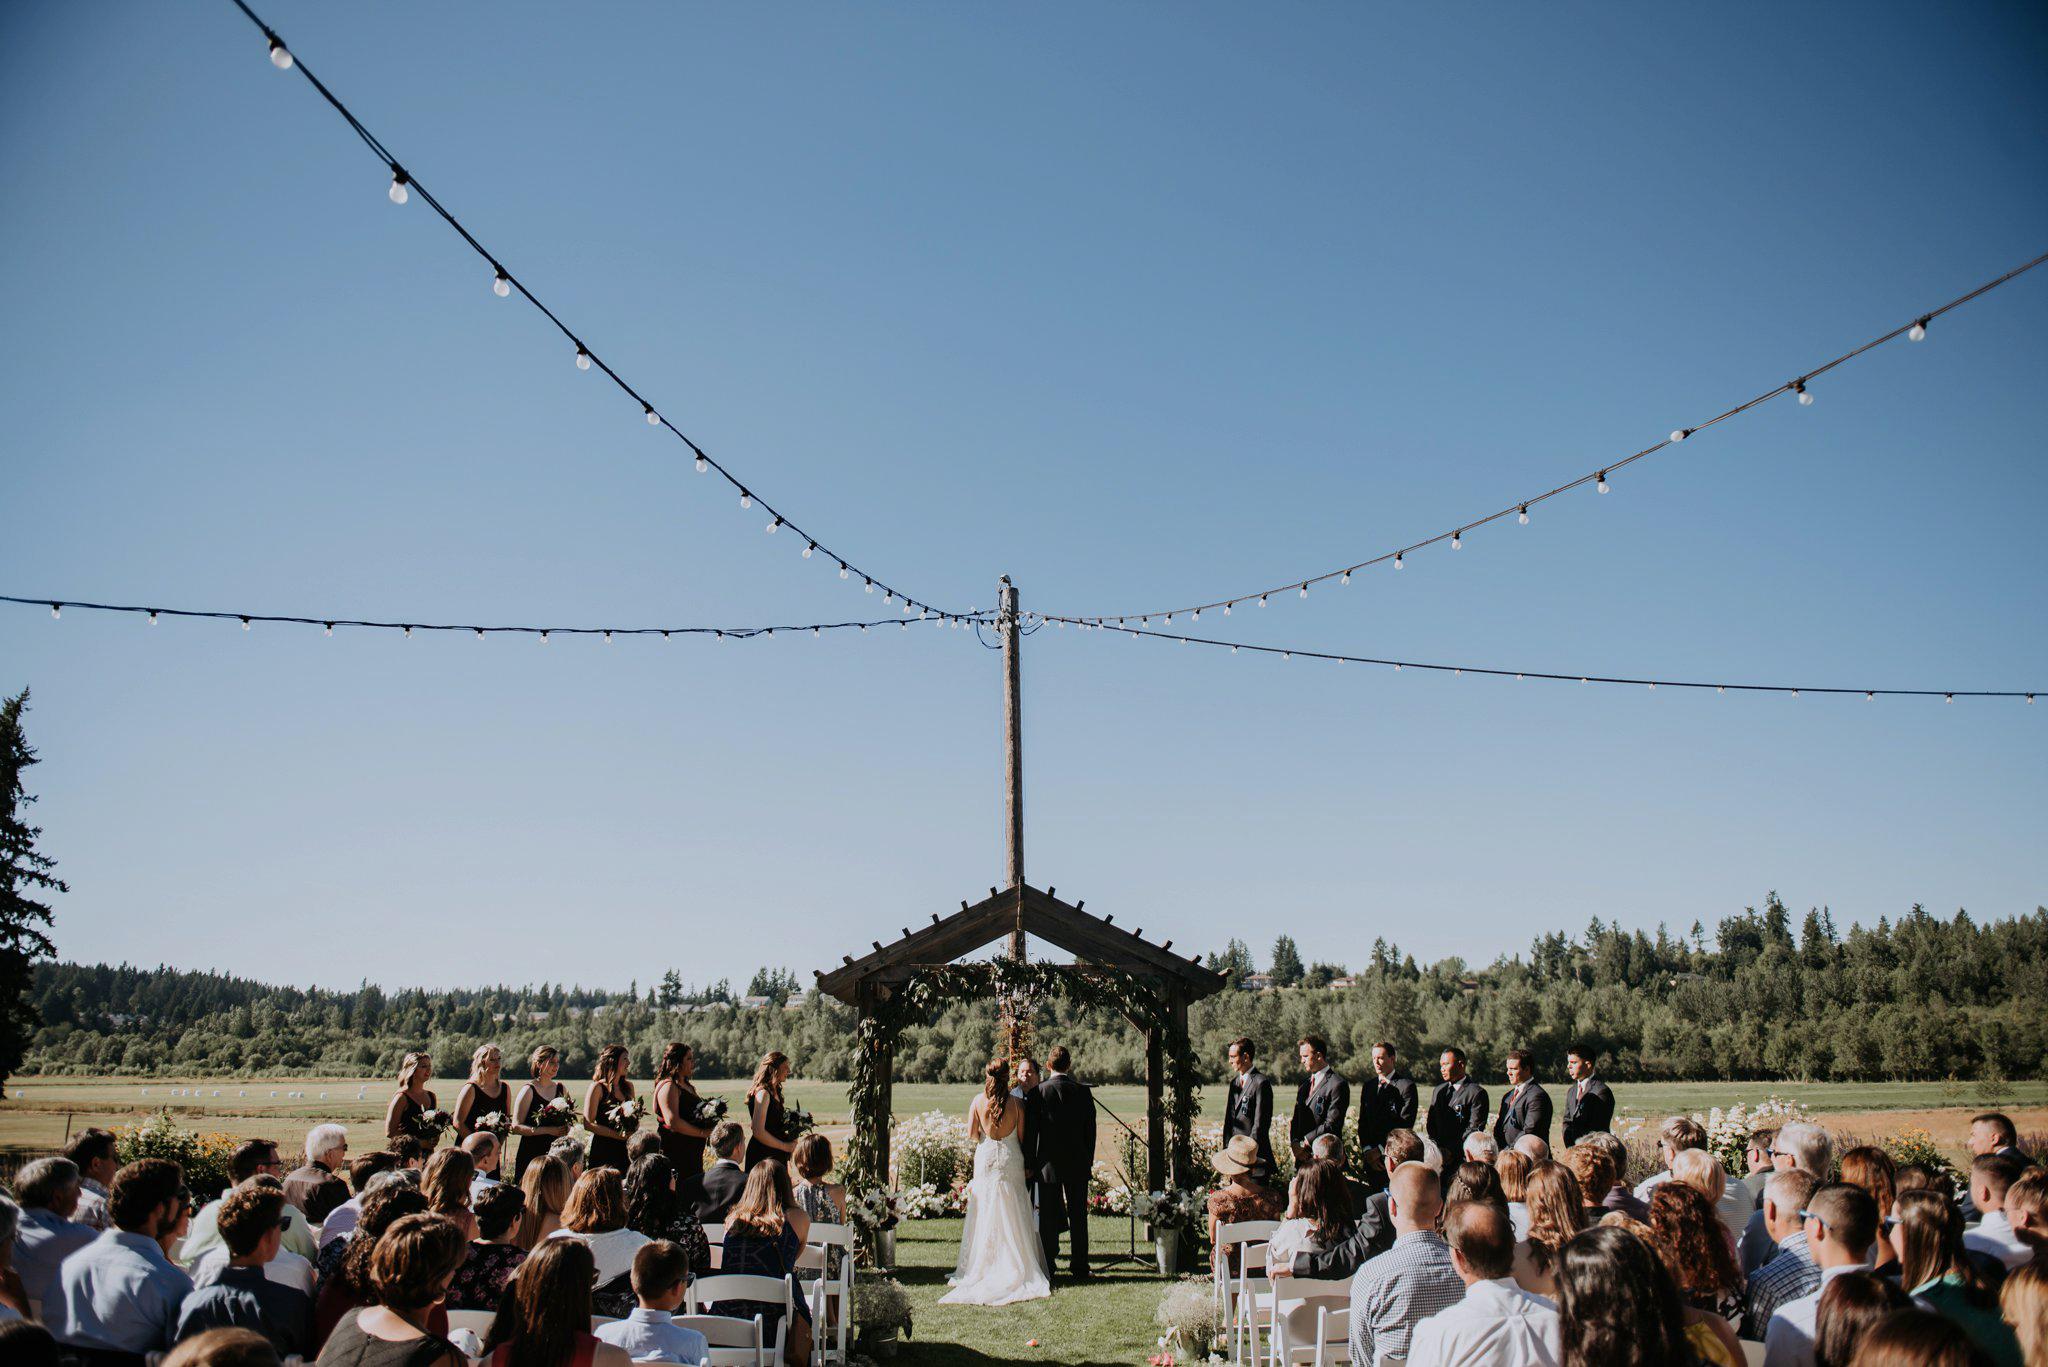 kristen-and-cody-the-kelley-farm-wedding-seattle-photographer-caitlyn-nikula-63.jpg